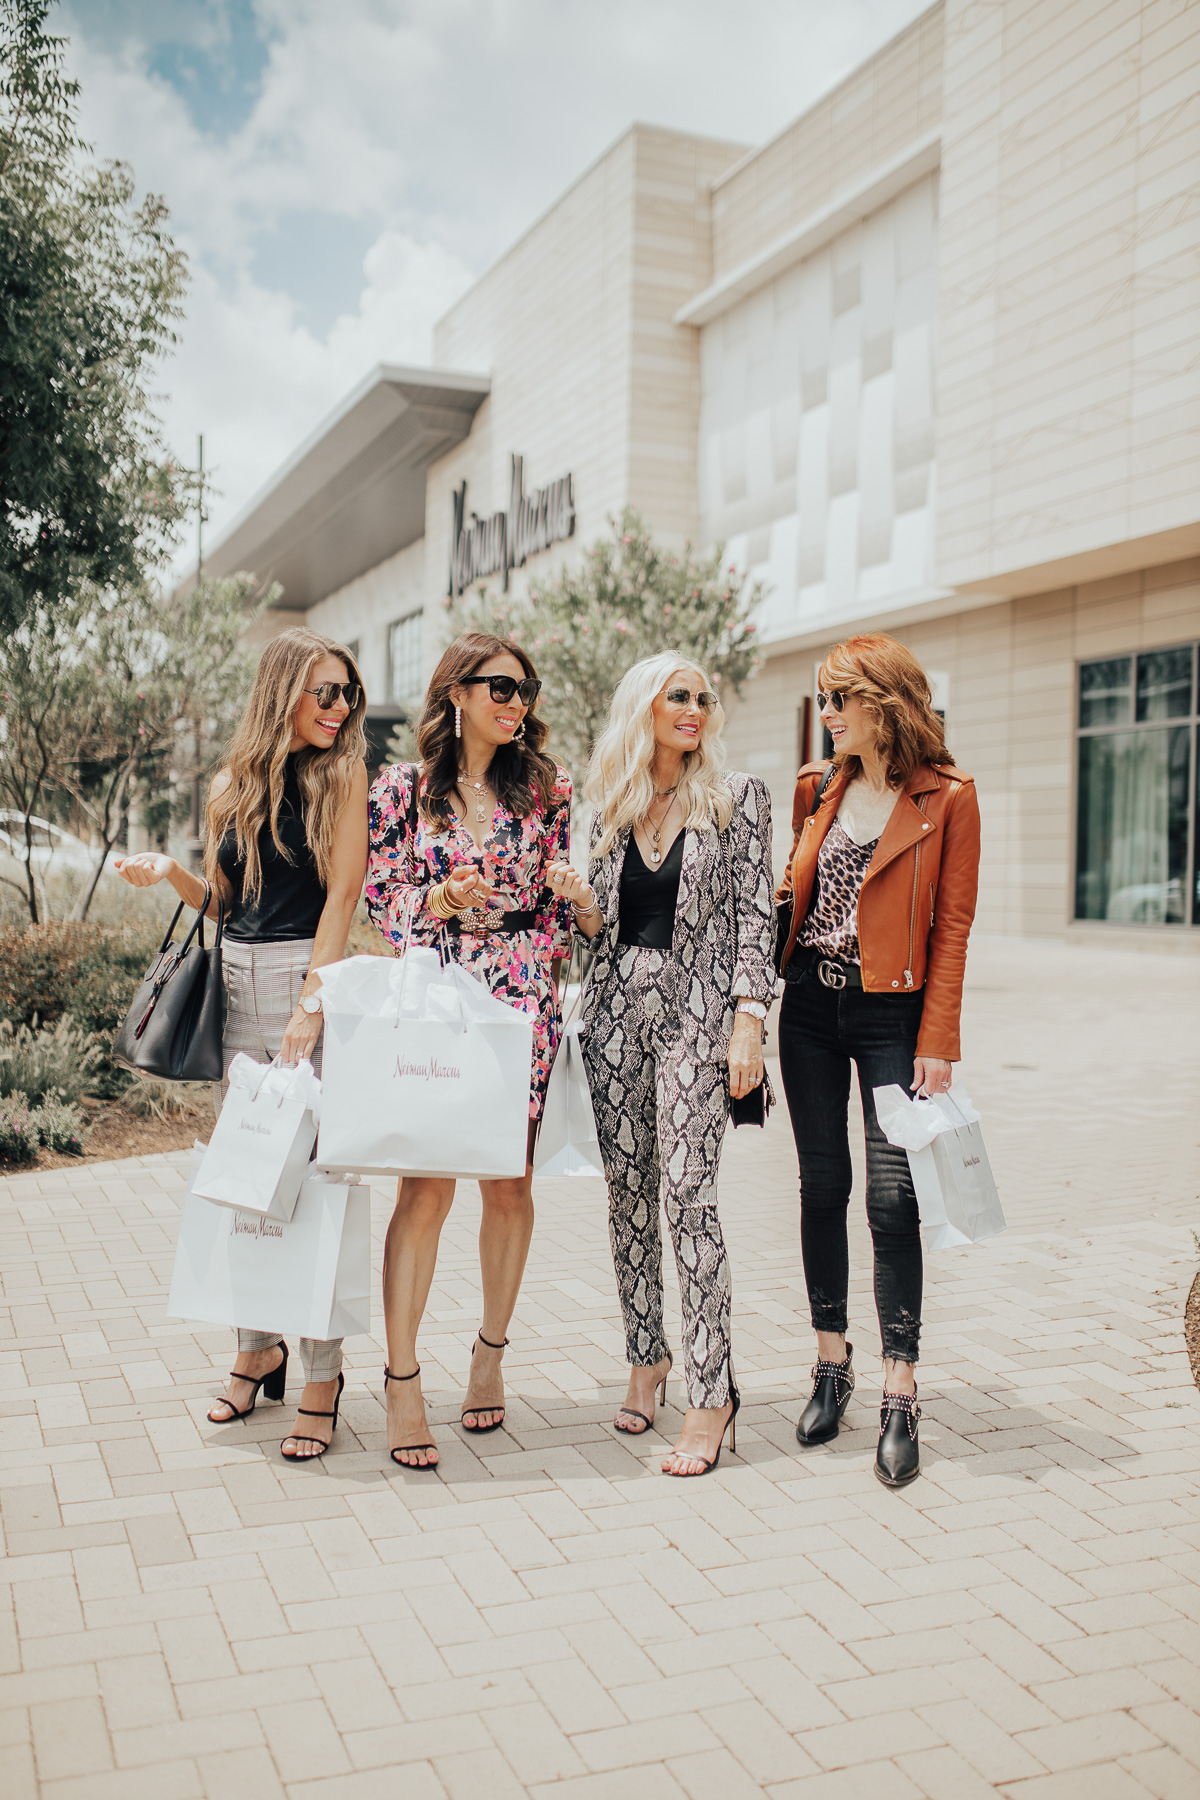 Neiman Marcus Fort Worth bloggers